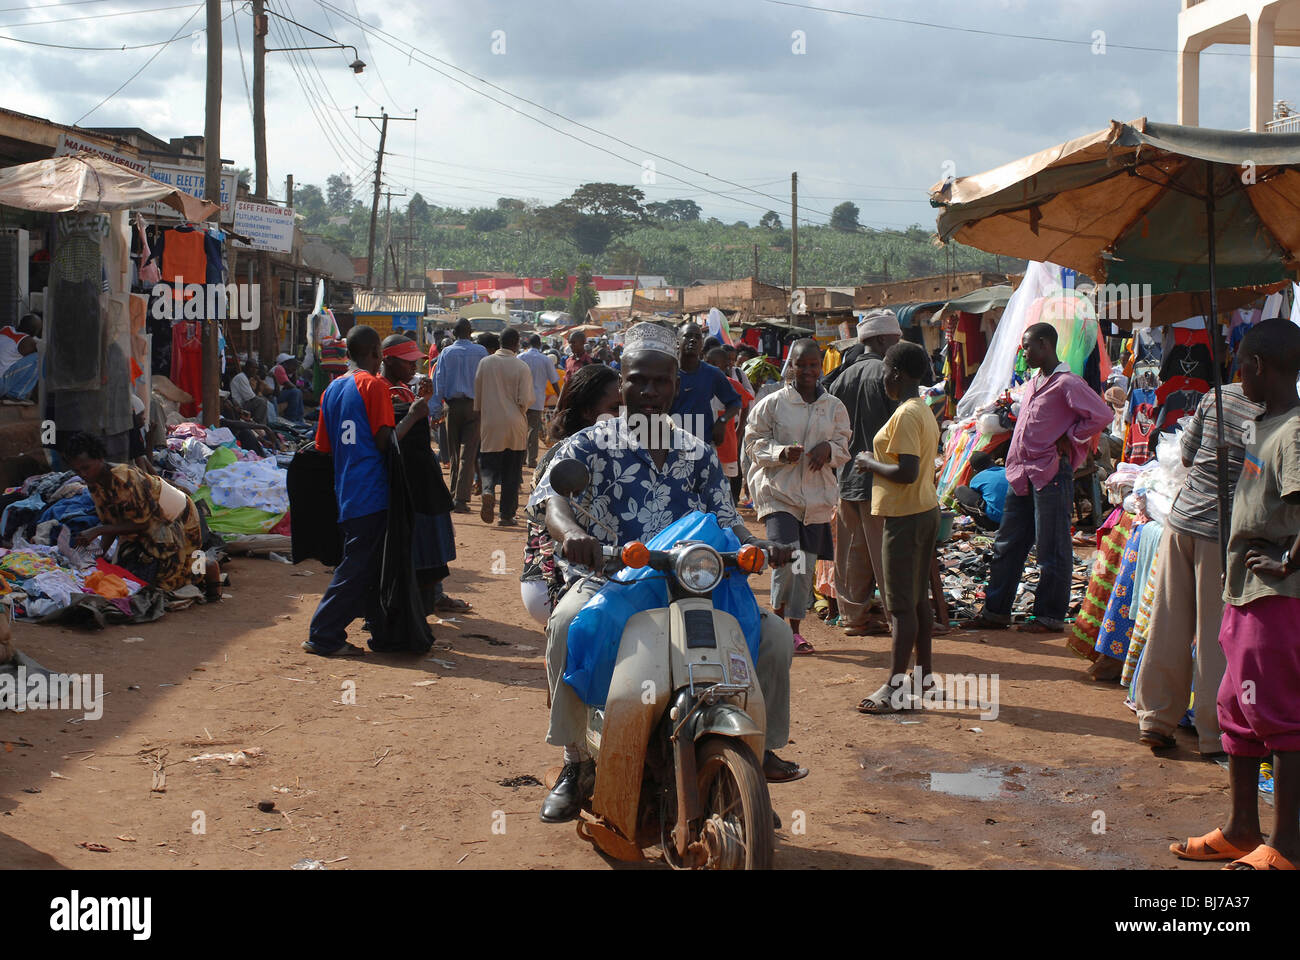 Market in Lilongwe, Malawi - Stock Image